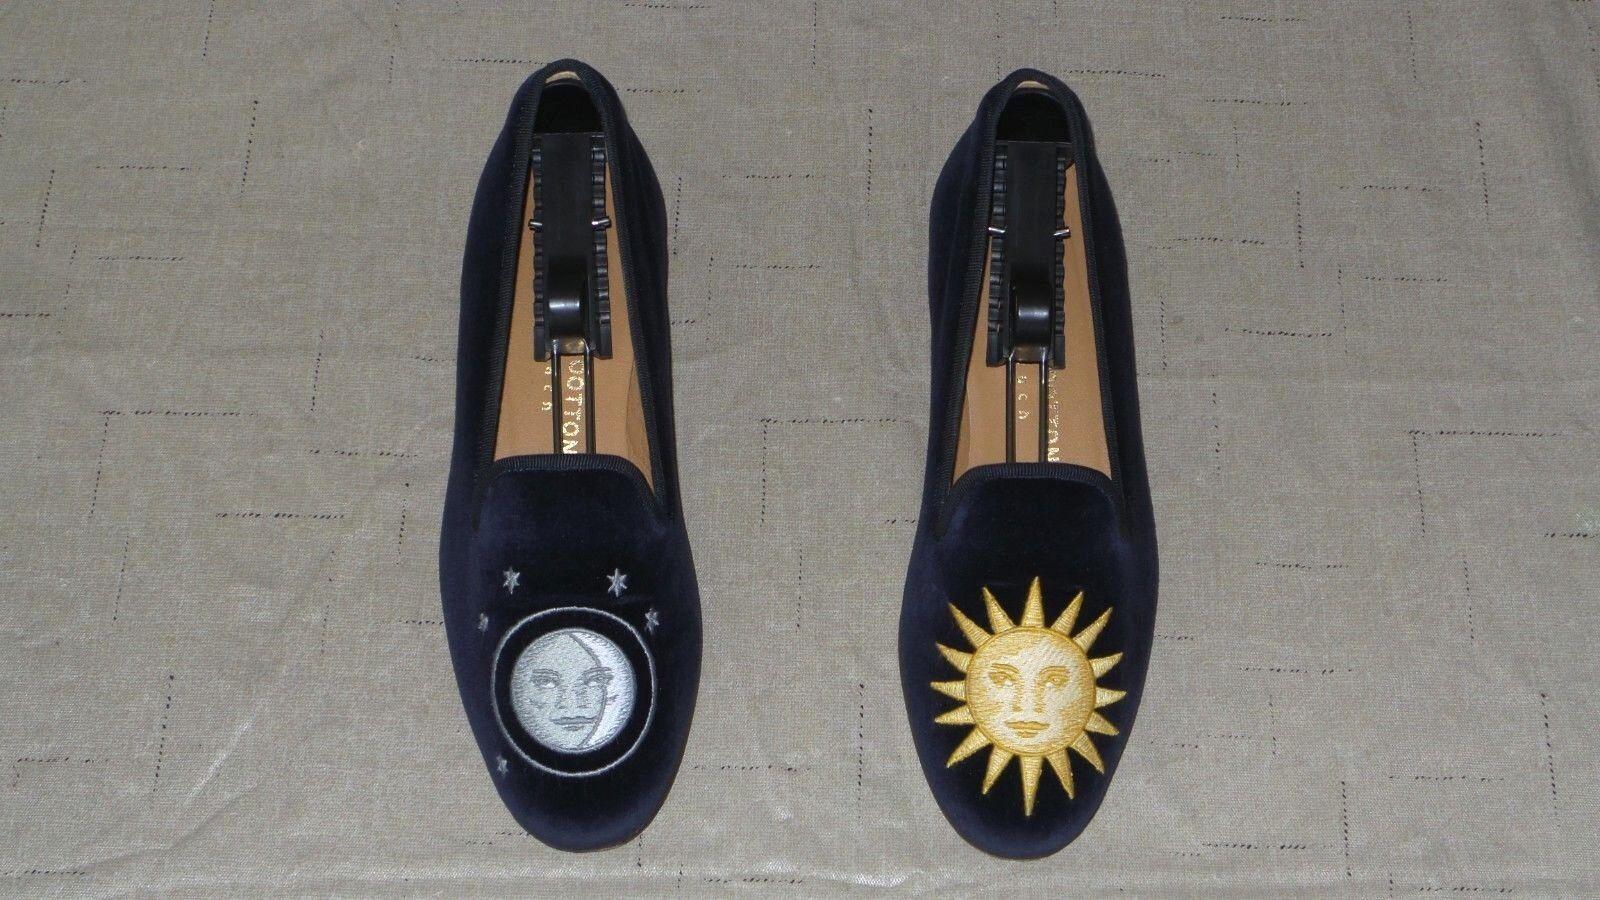 Tan lindo  Mujer  450 Stubbs and wootton Velvet  nitenday  Zapatillas Mocasines Zapato